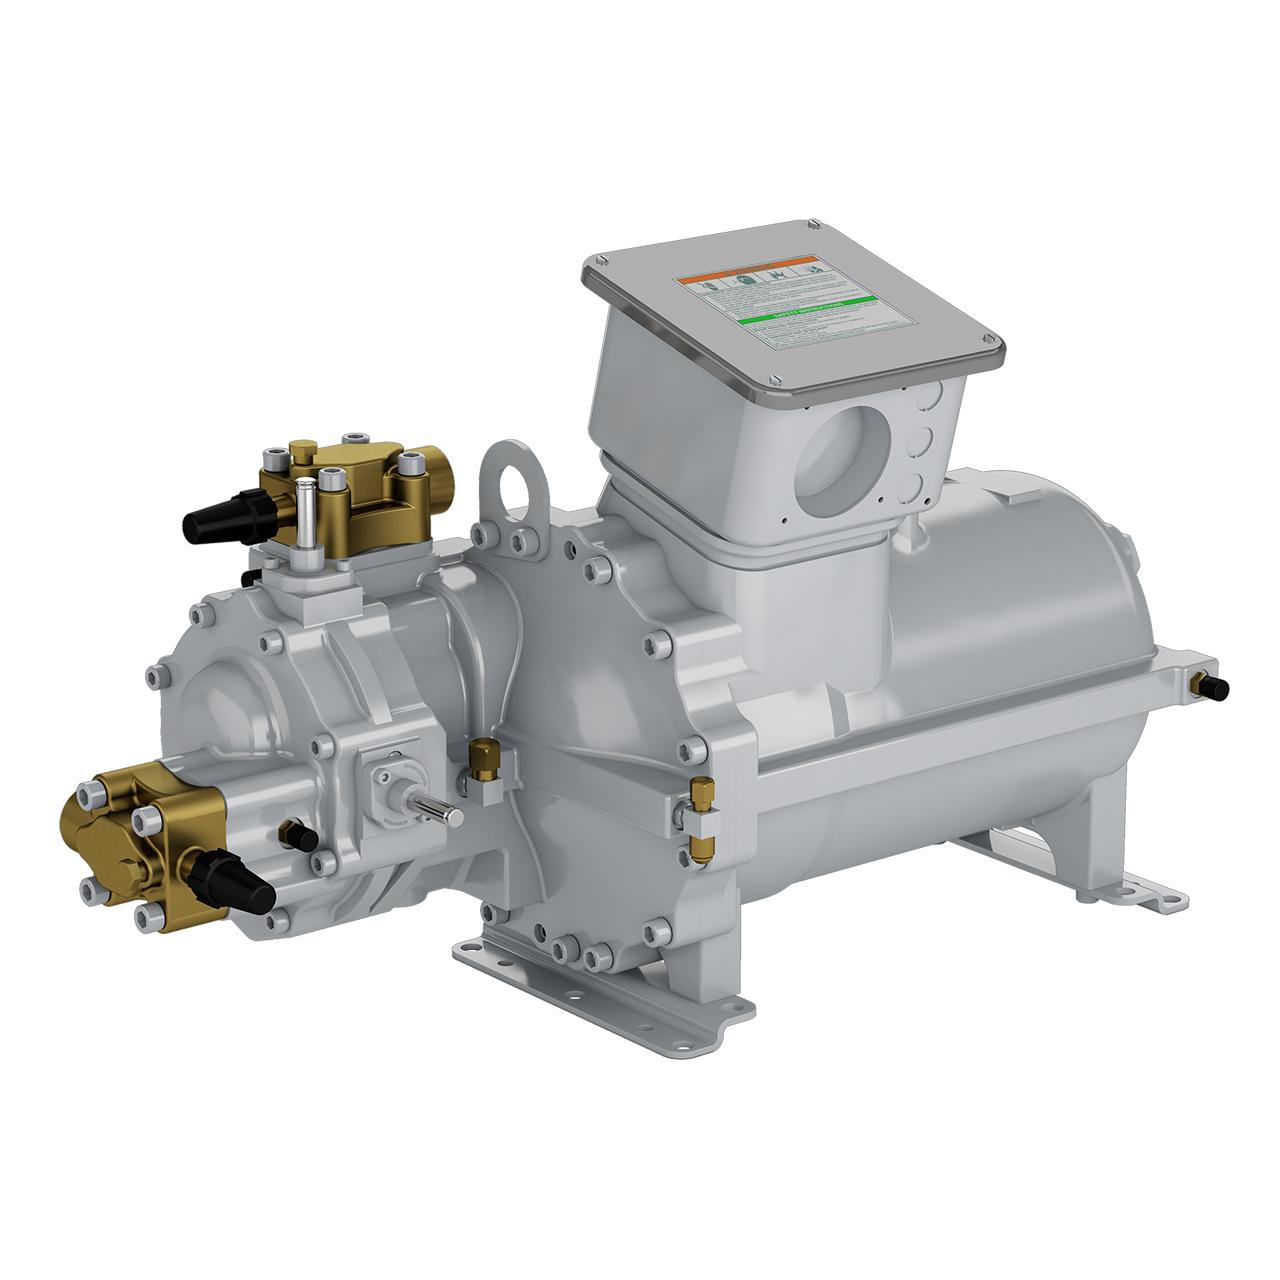 carlyle-compressor-06t